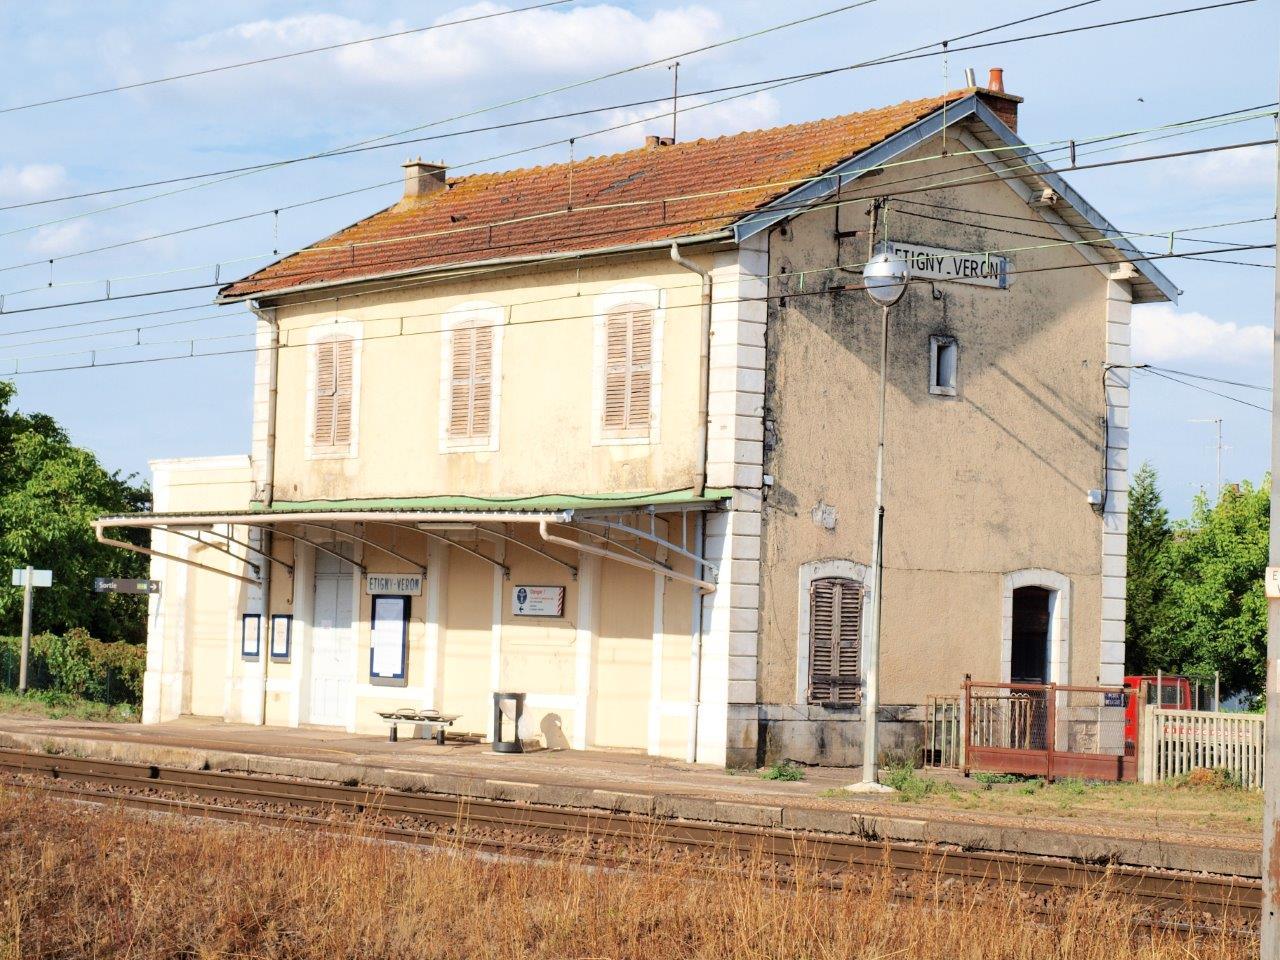 gare-d-etigny-veron-train-station